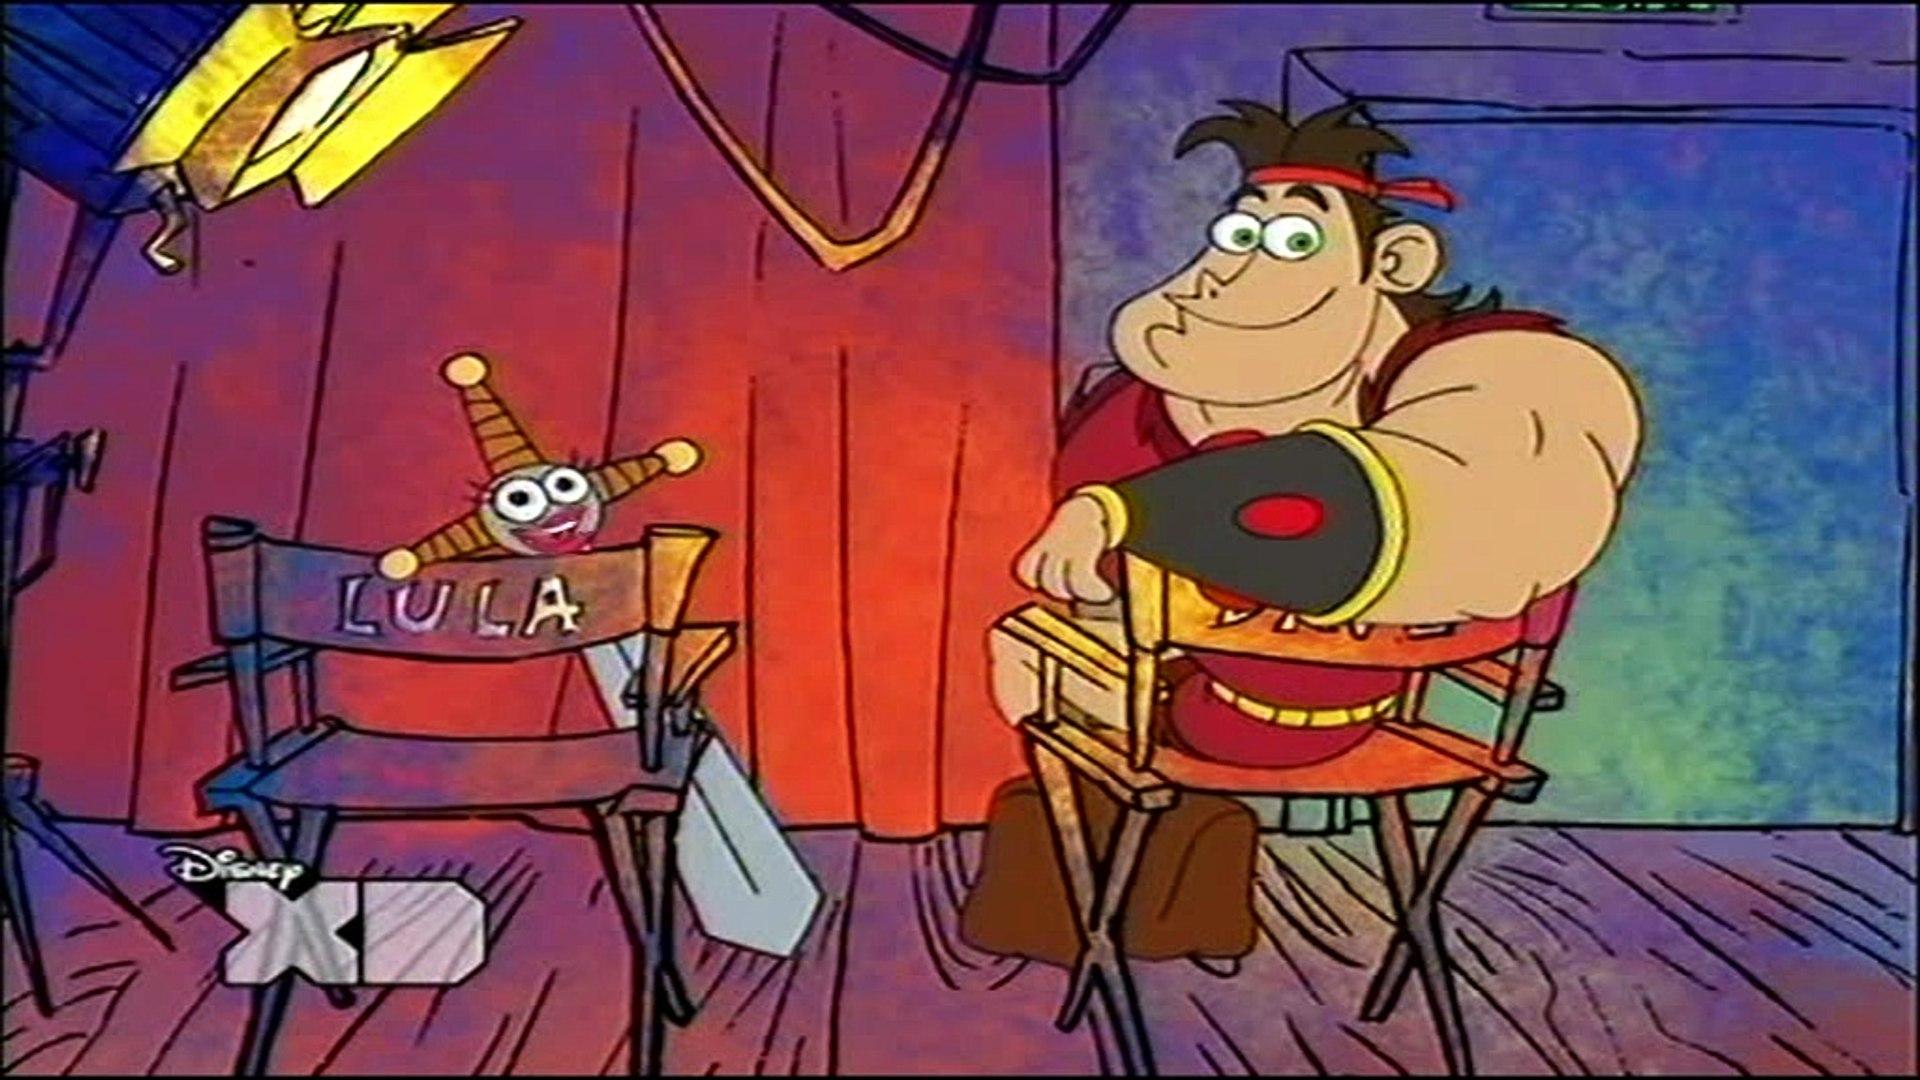 Disney's Barbaren-Dave - 02. b) Lulas erstes Mal 06. a) Nicht gesellschaftsfähig 06. b) Der dop